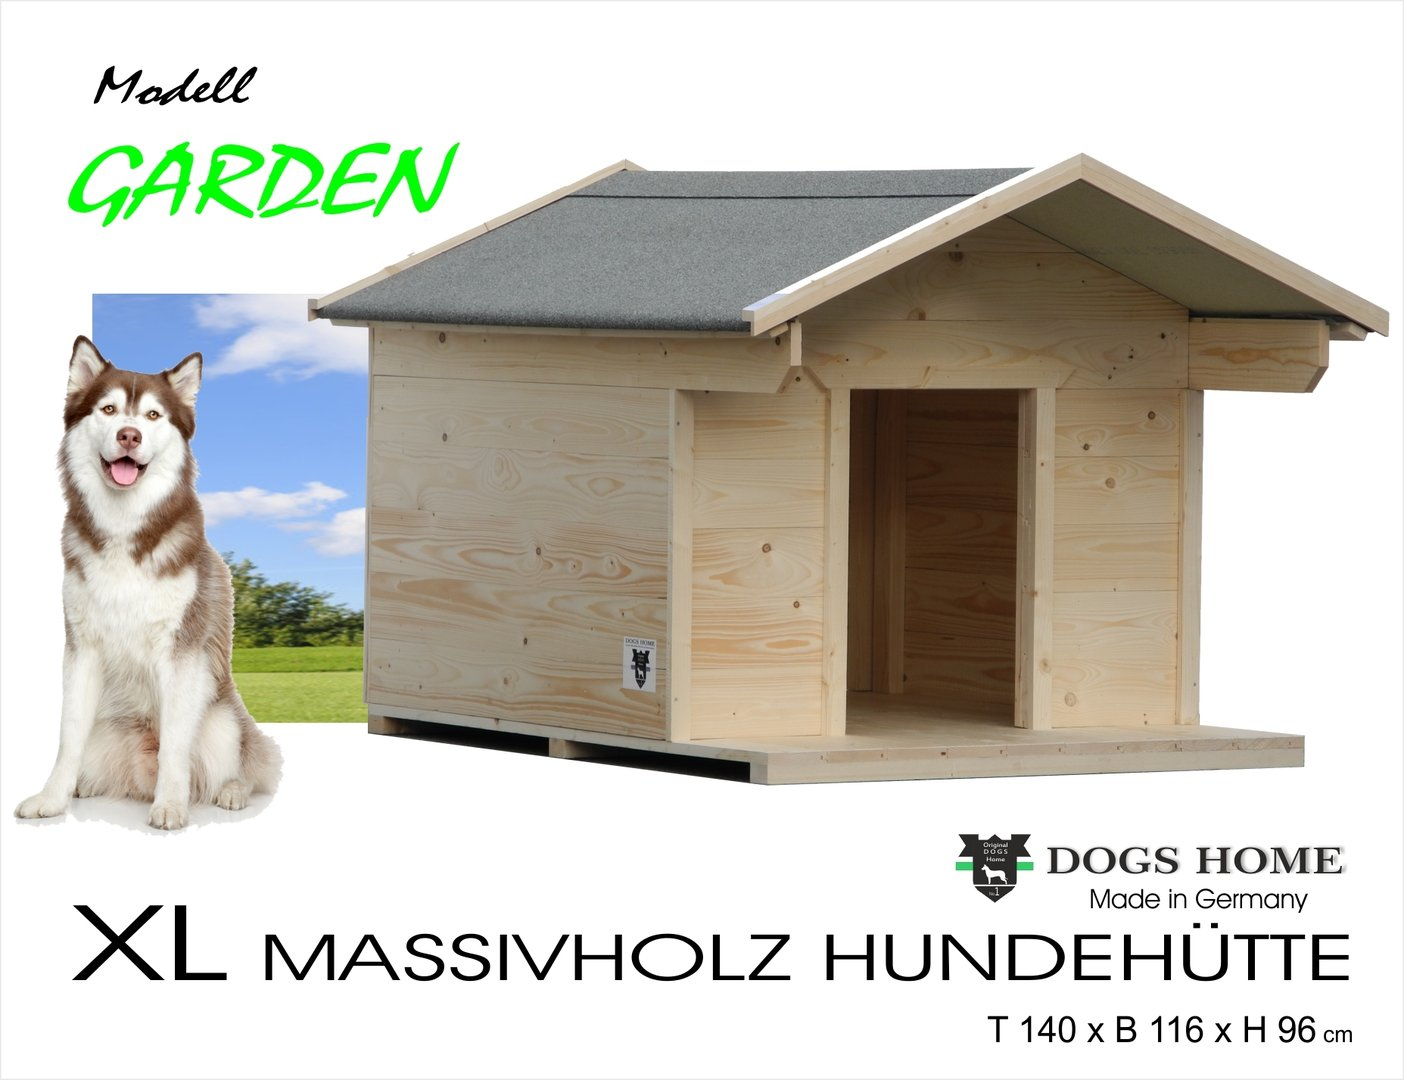 dogshome hundehütte garden xl outdoor wetterfest